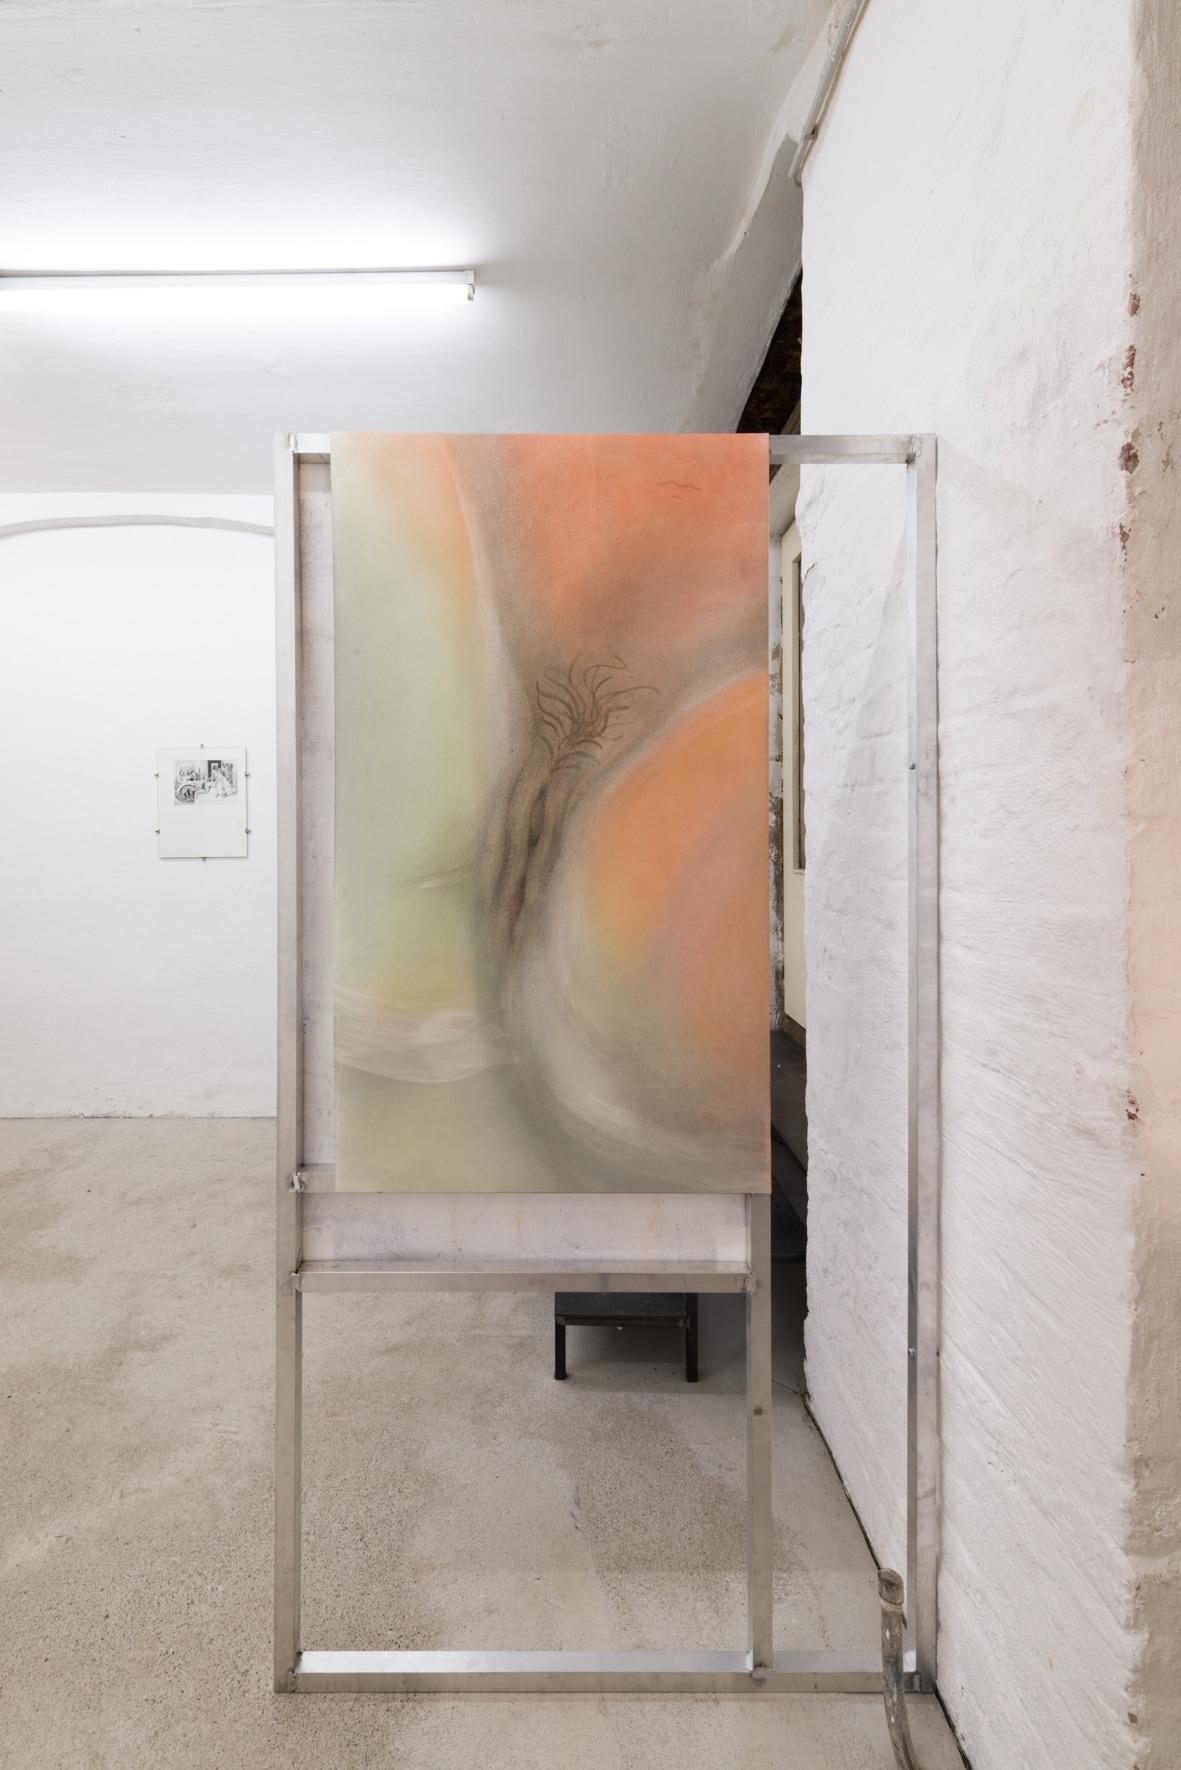 Exhibition View (Kea Bolenz, Evelyn Plaschg)